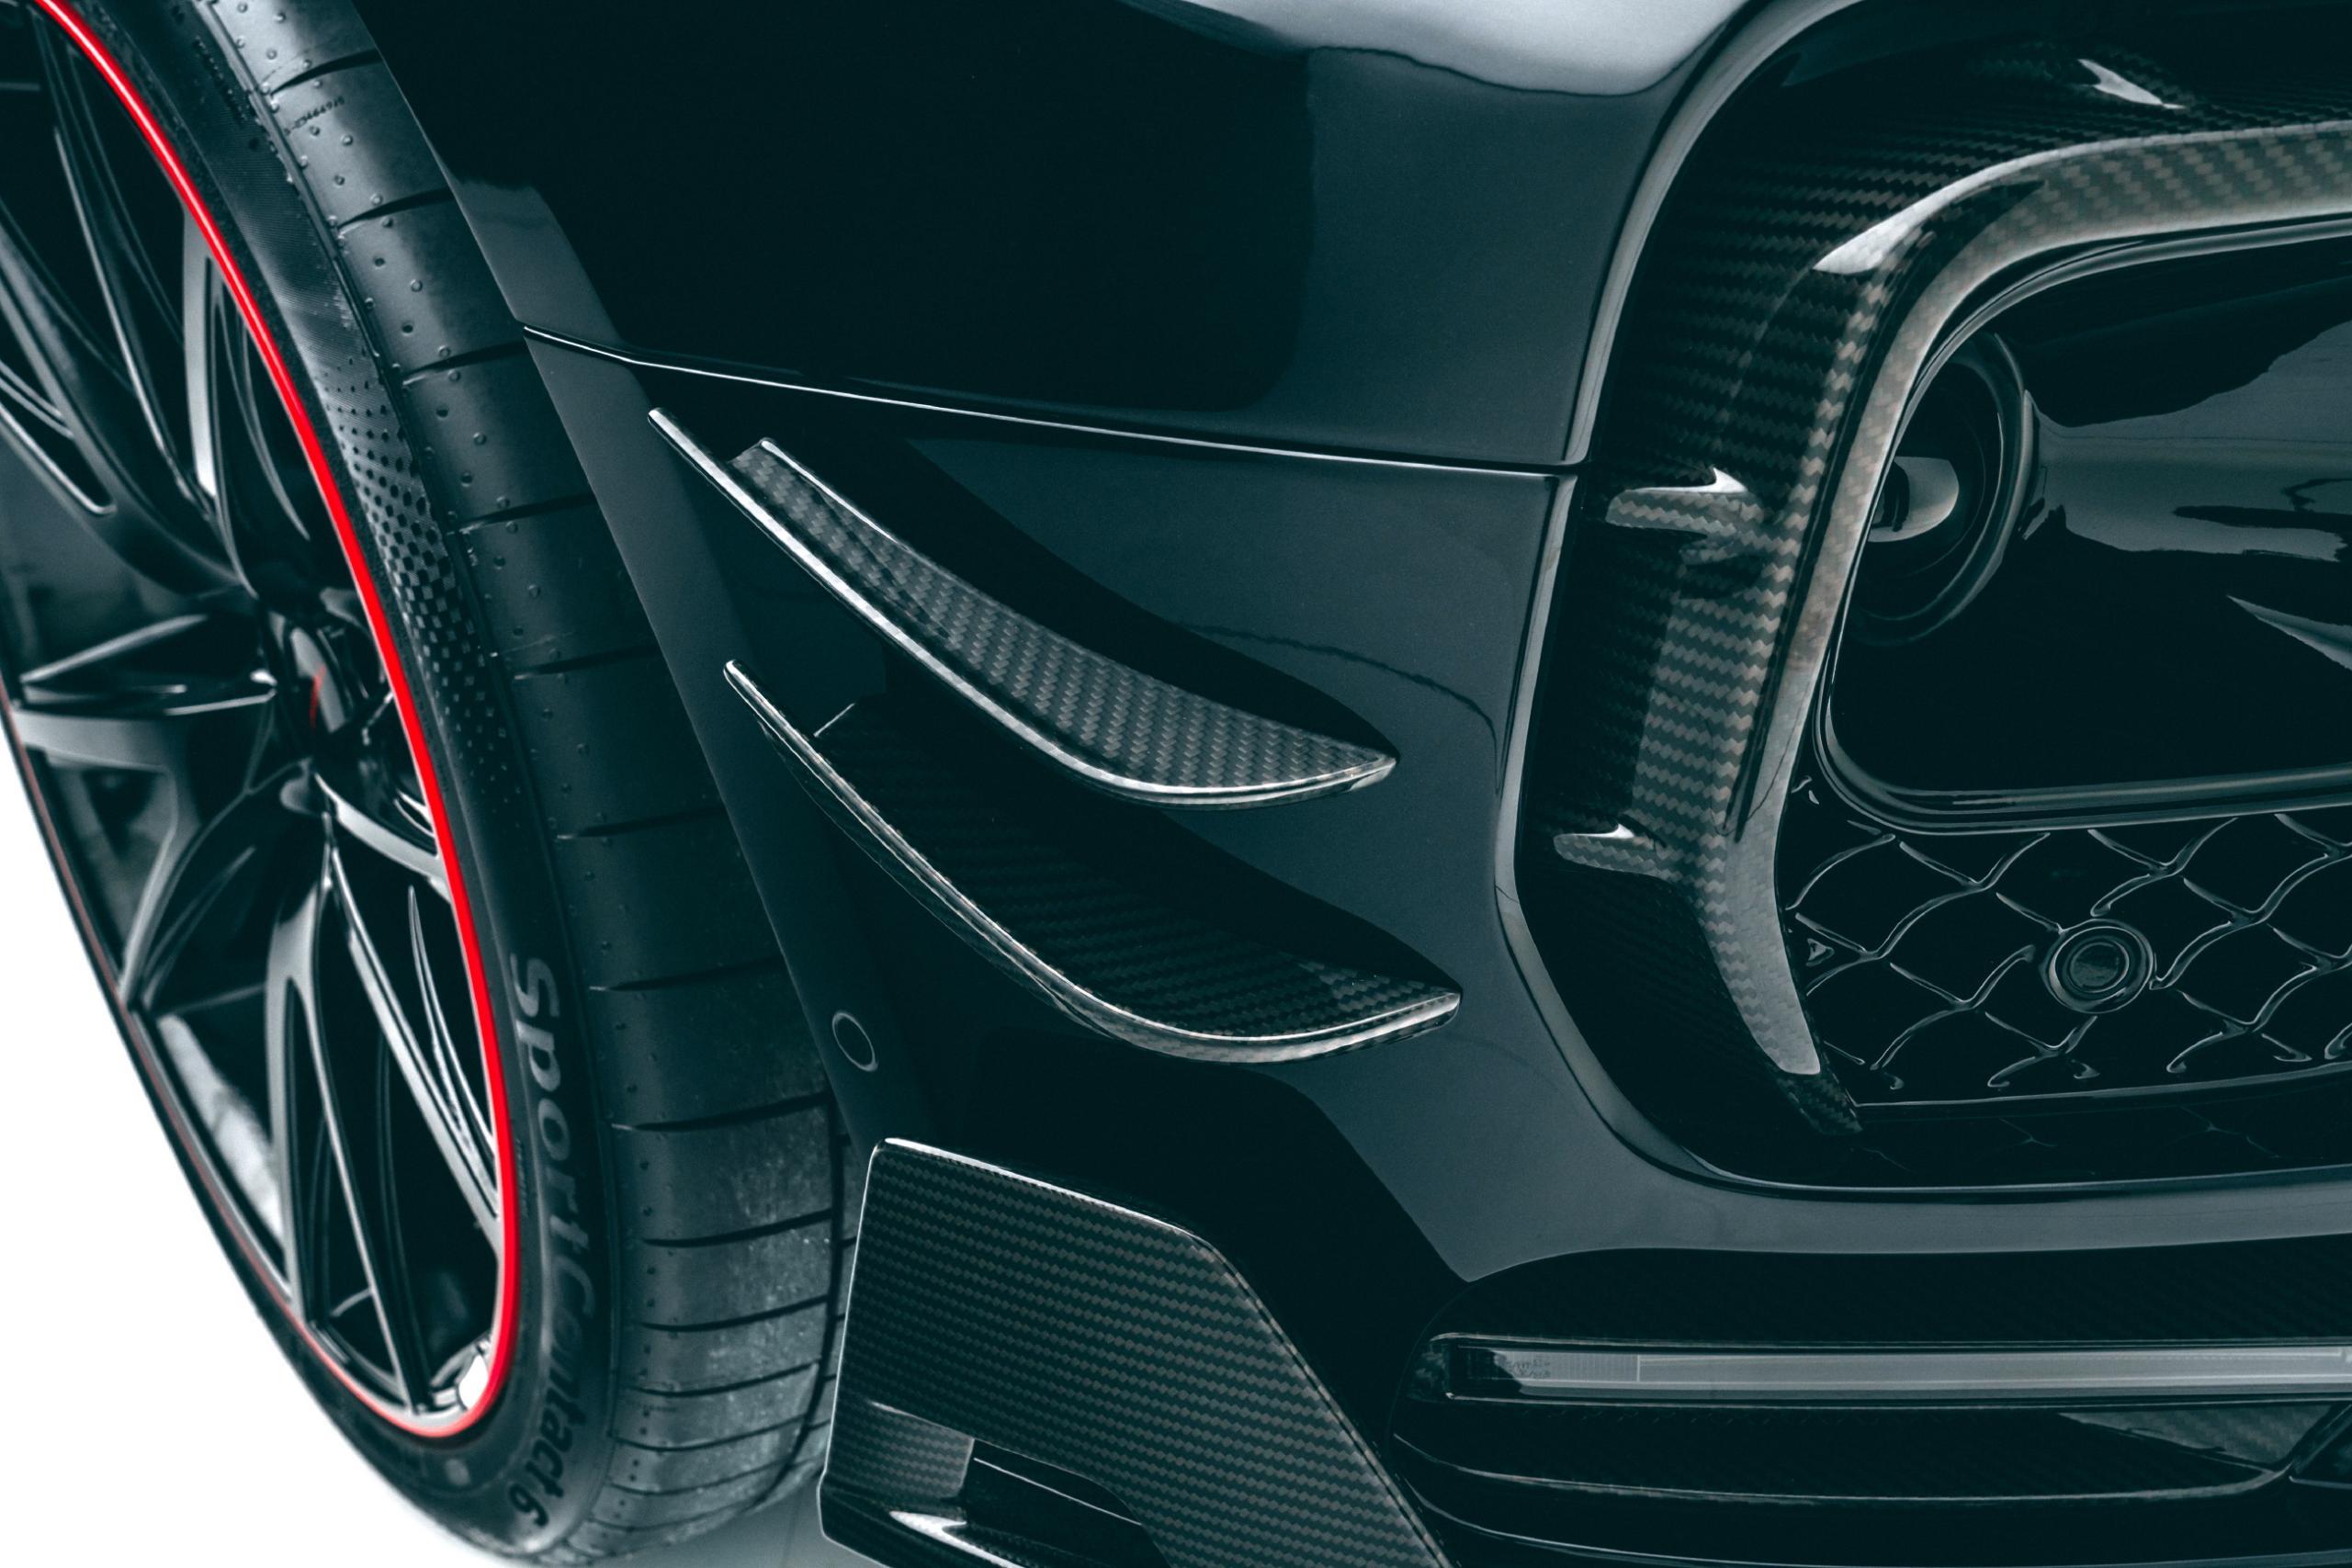 mansory new bentayga wide body kit carbon fiber race flap y.5 23 wheel 2021